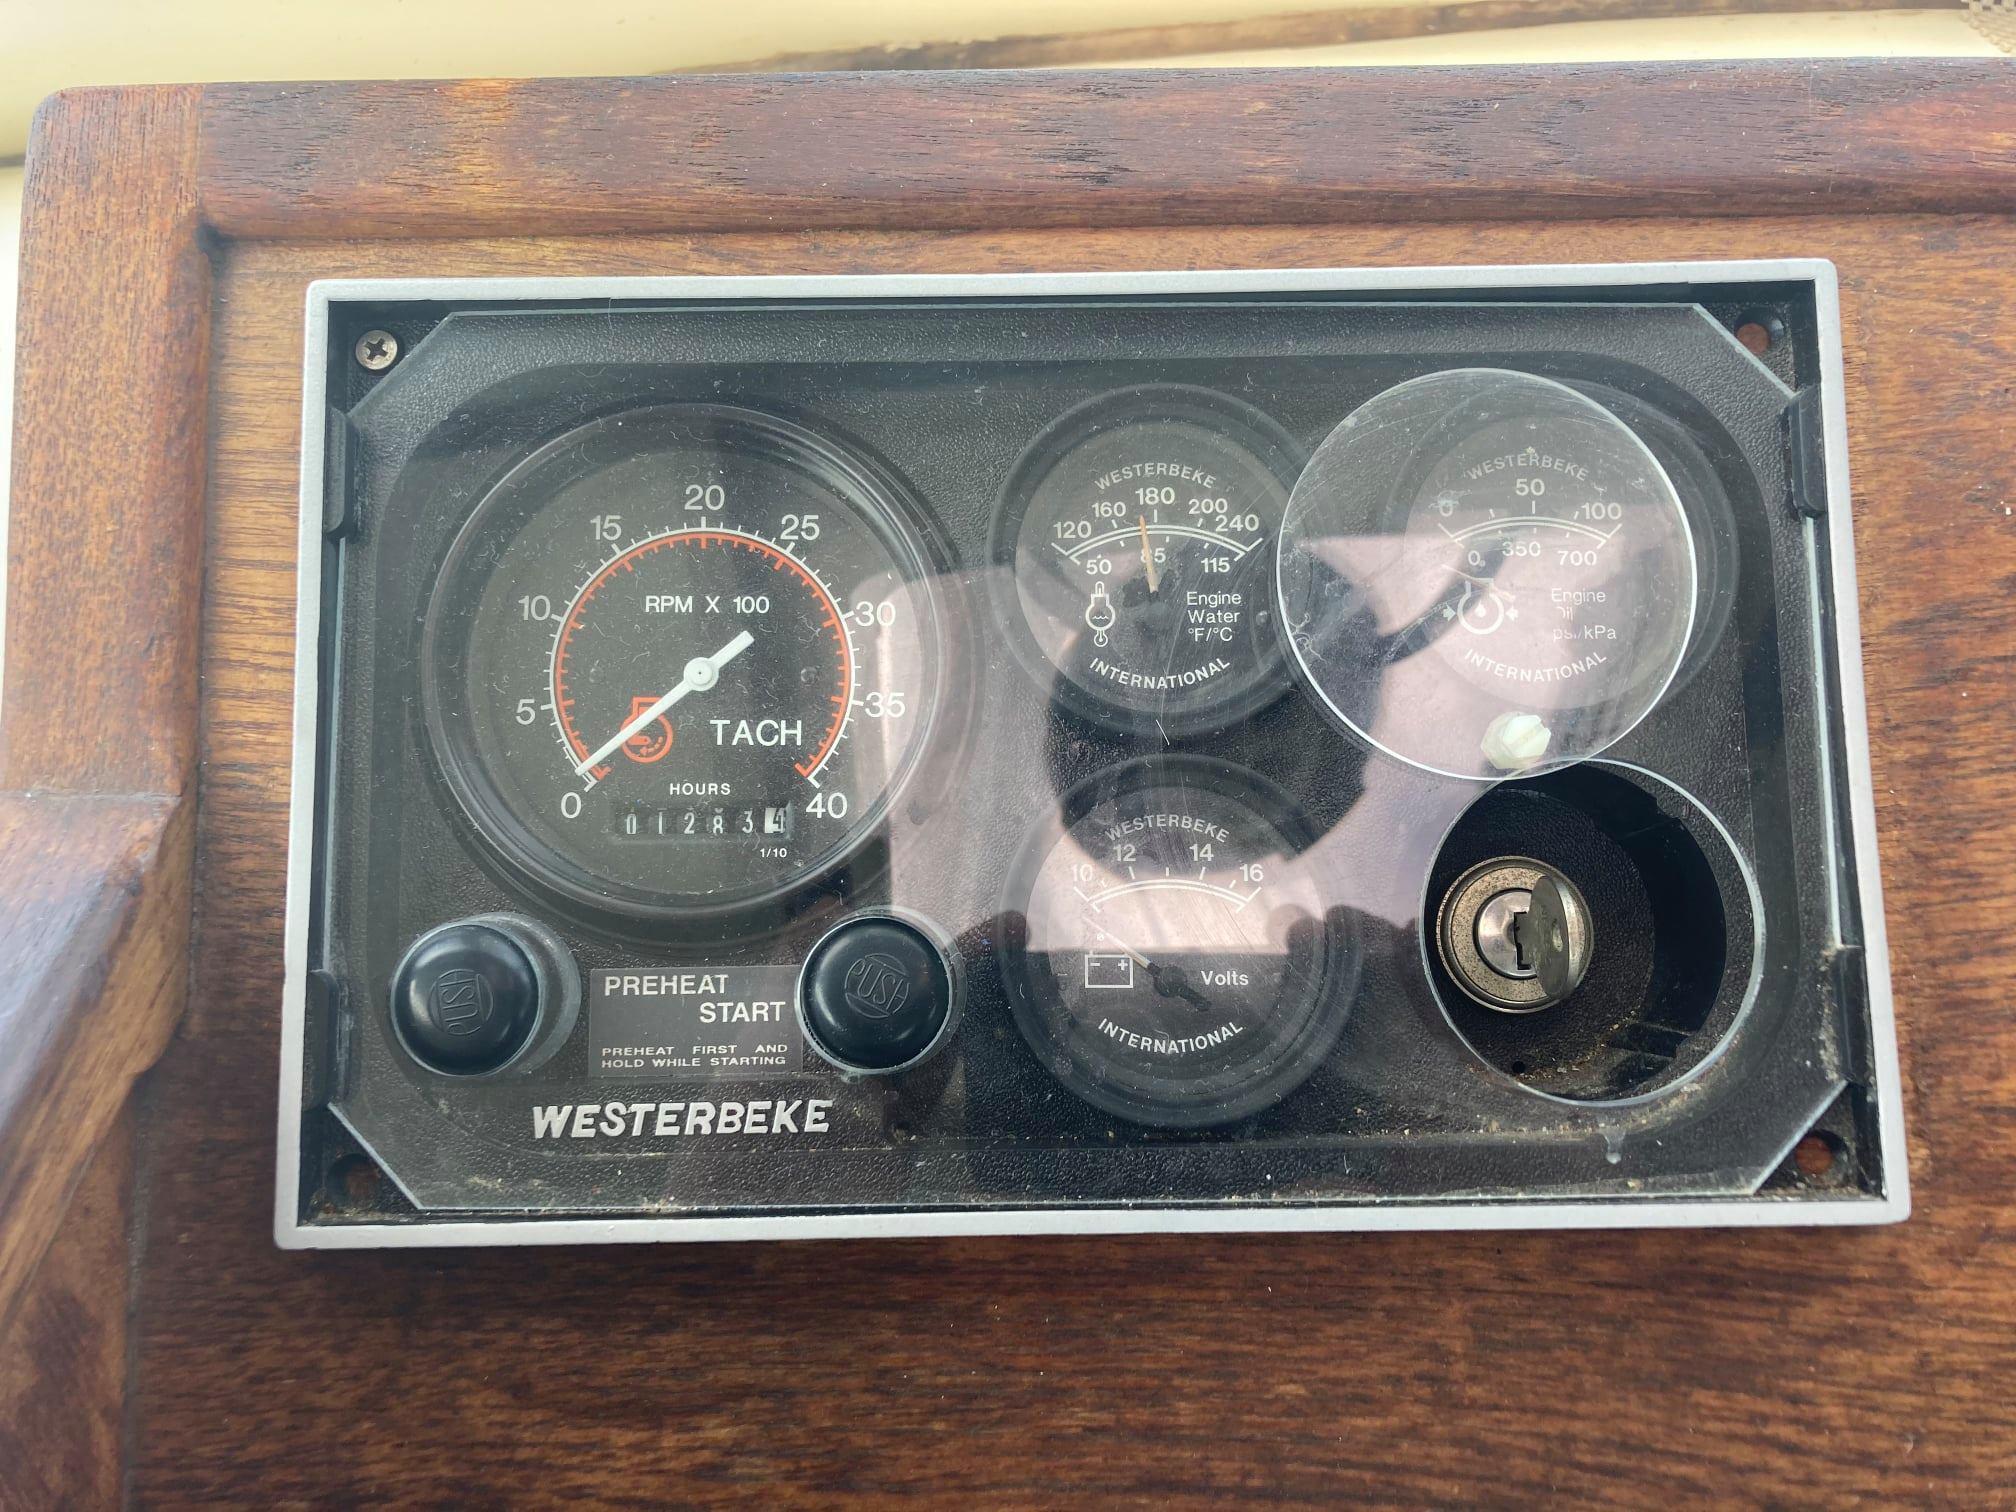 147 - Wawenoc - motor1